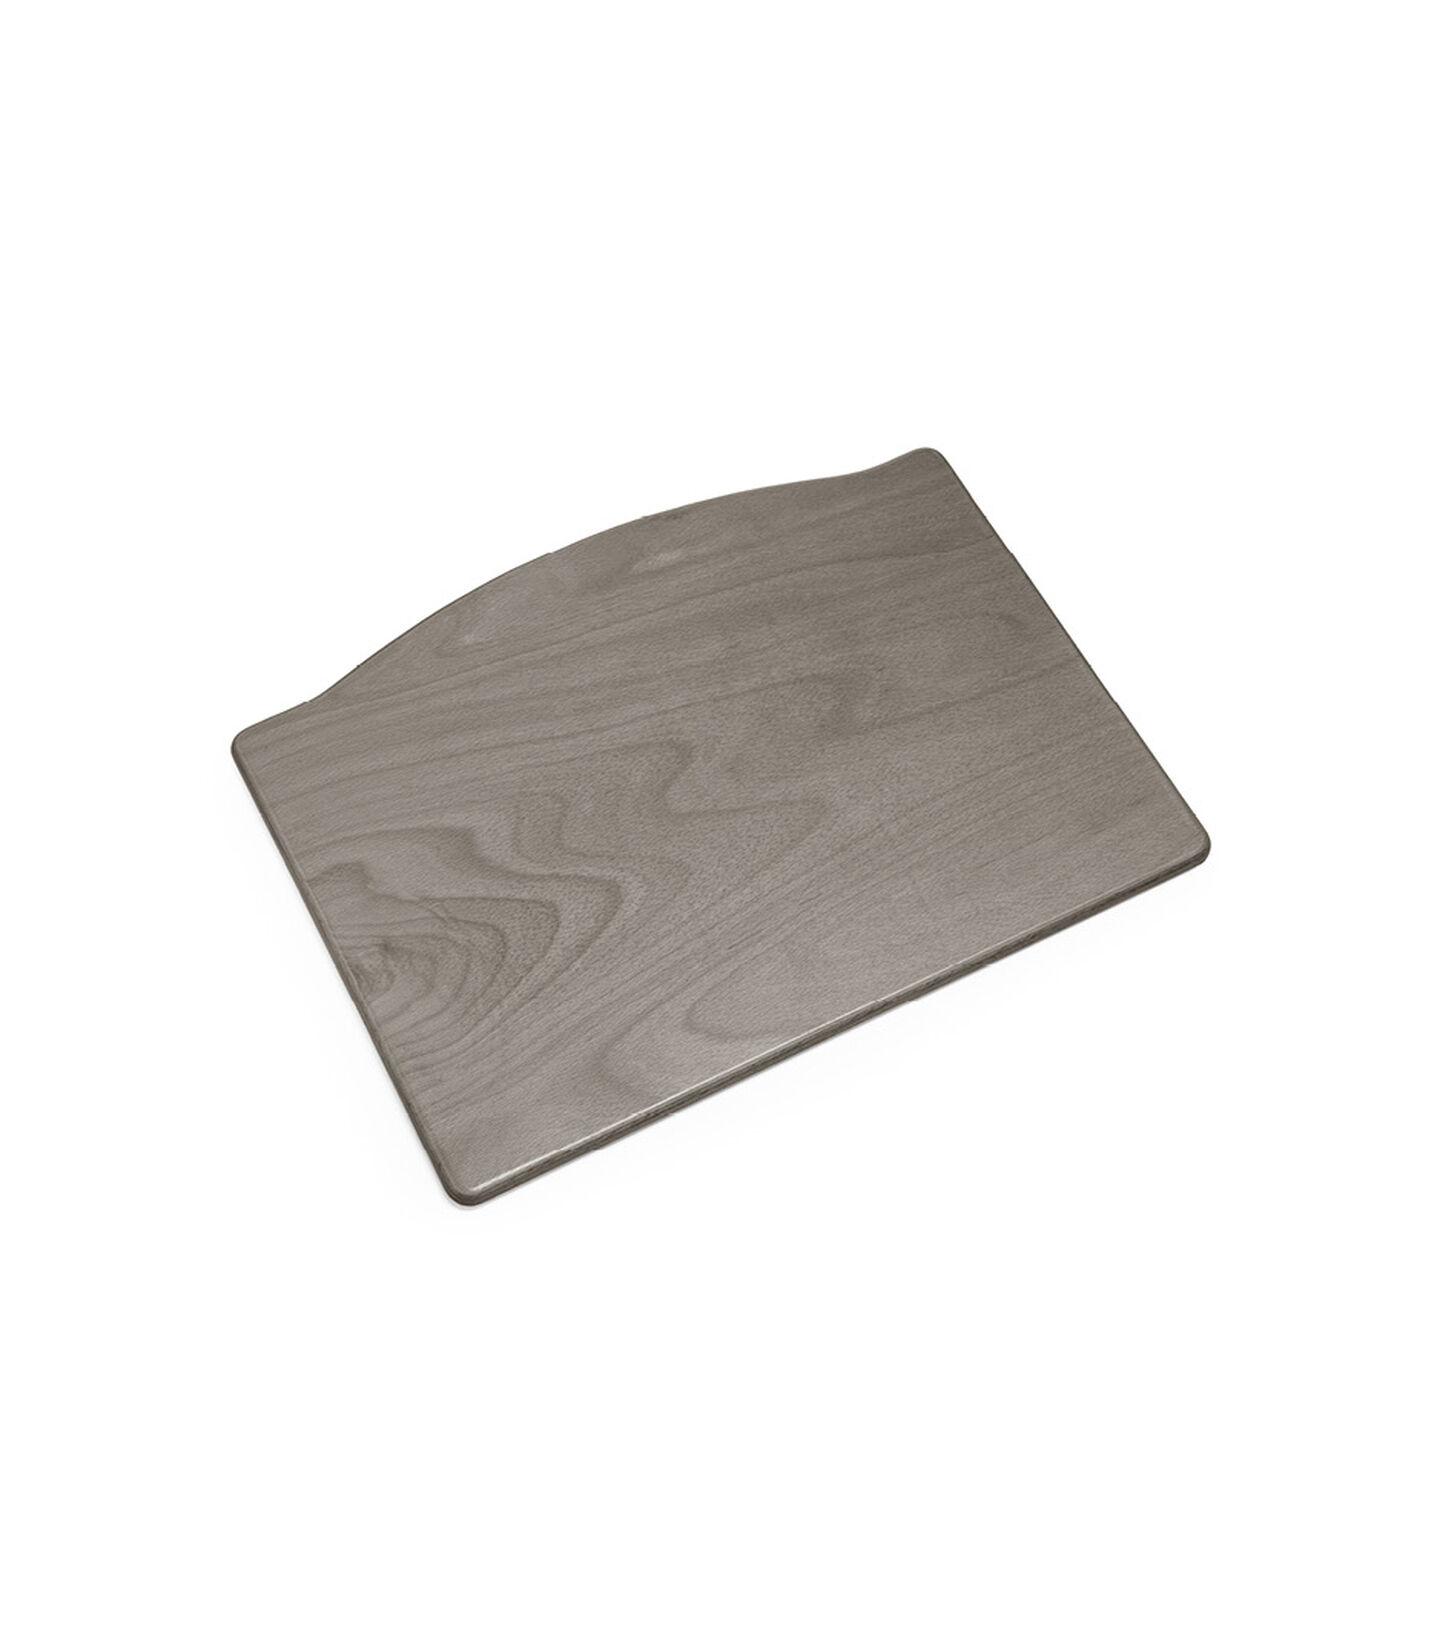 Tripp Trapp® Footplate Hazy Grey, Hazy Grey, mainview view 2